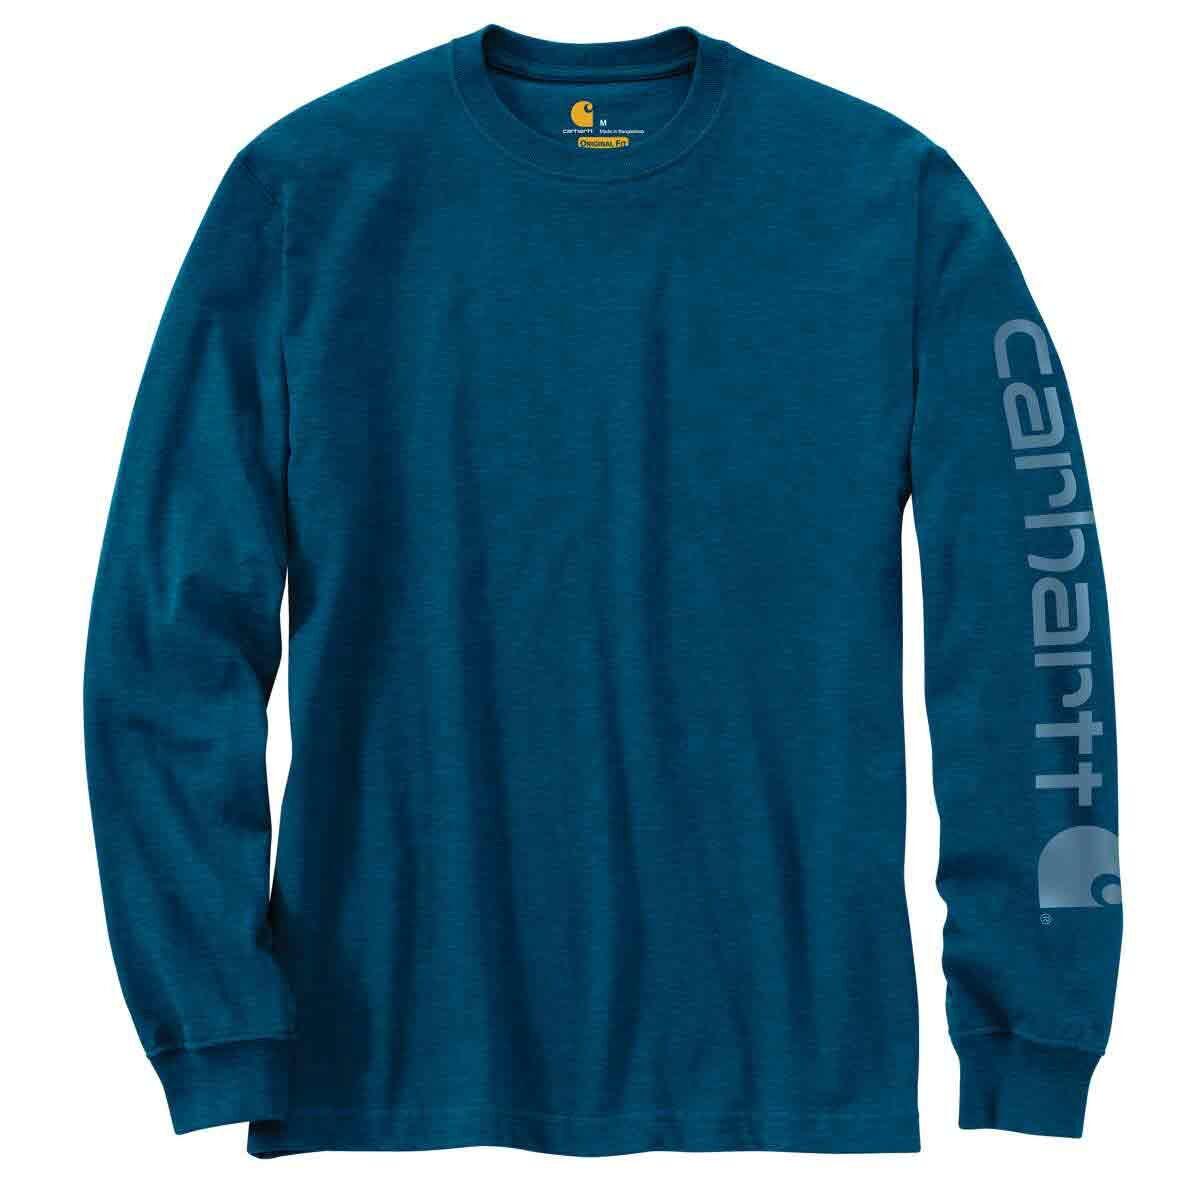 Carhartt Men's Long-Sleeve Graphic Logo Tee - Blue, S